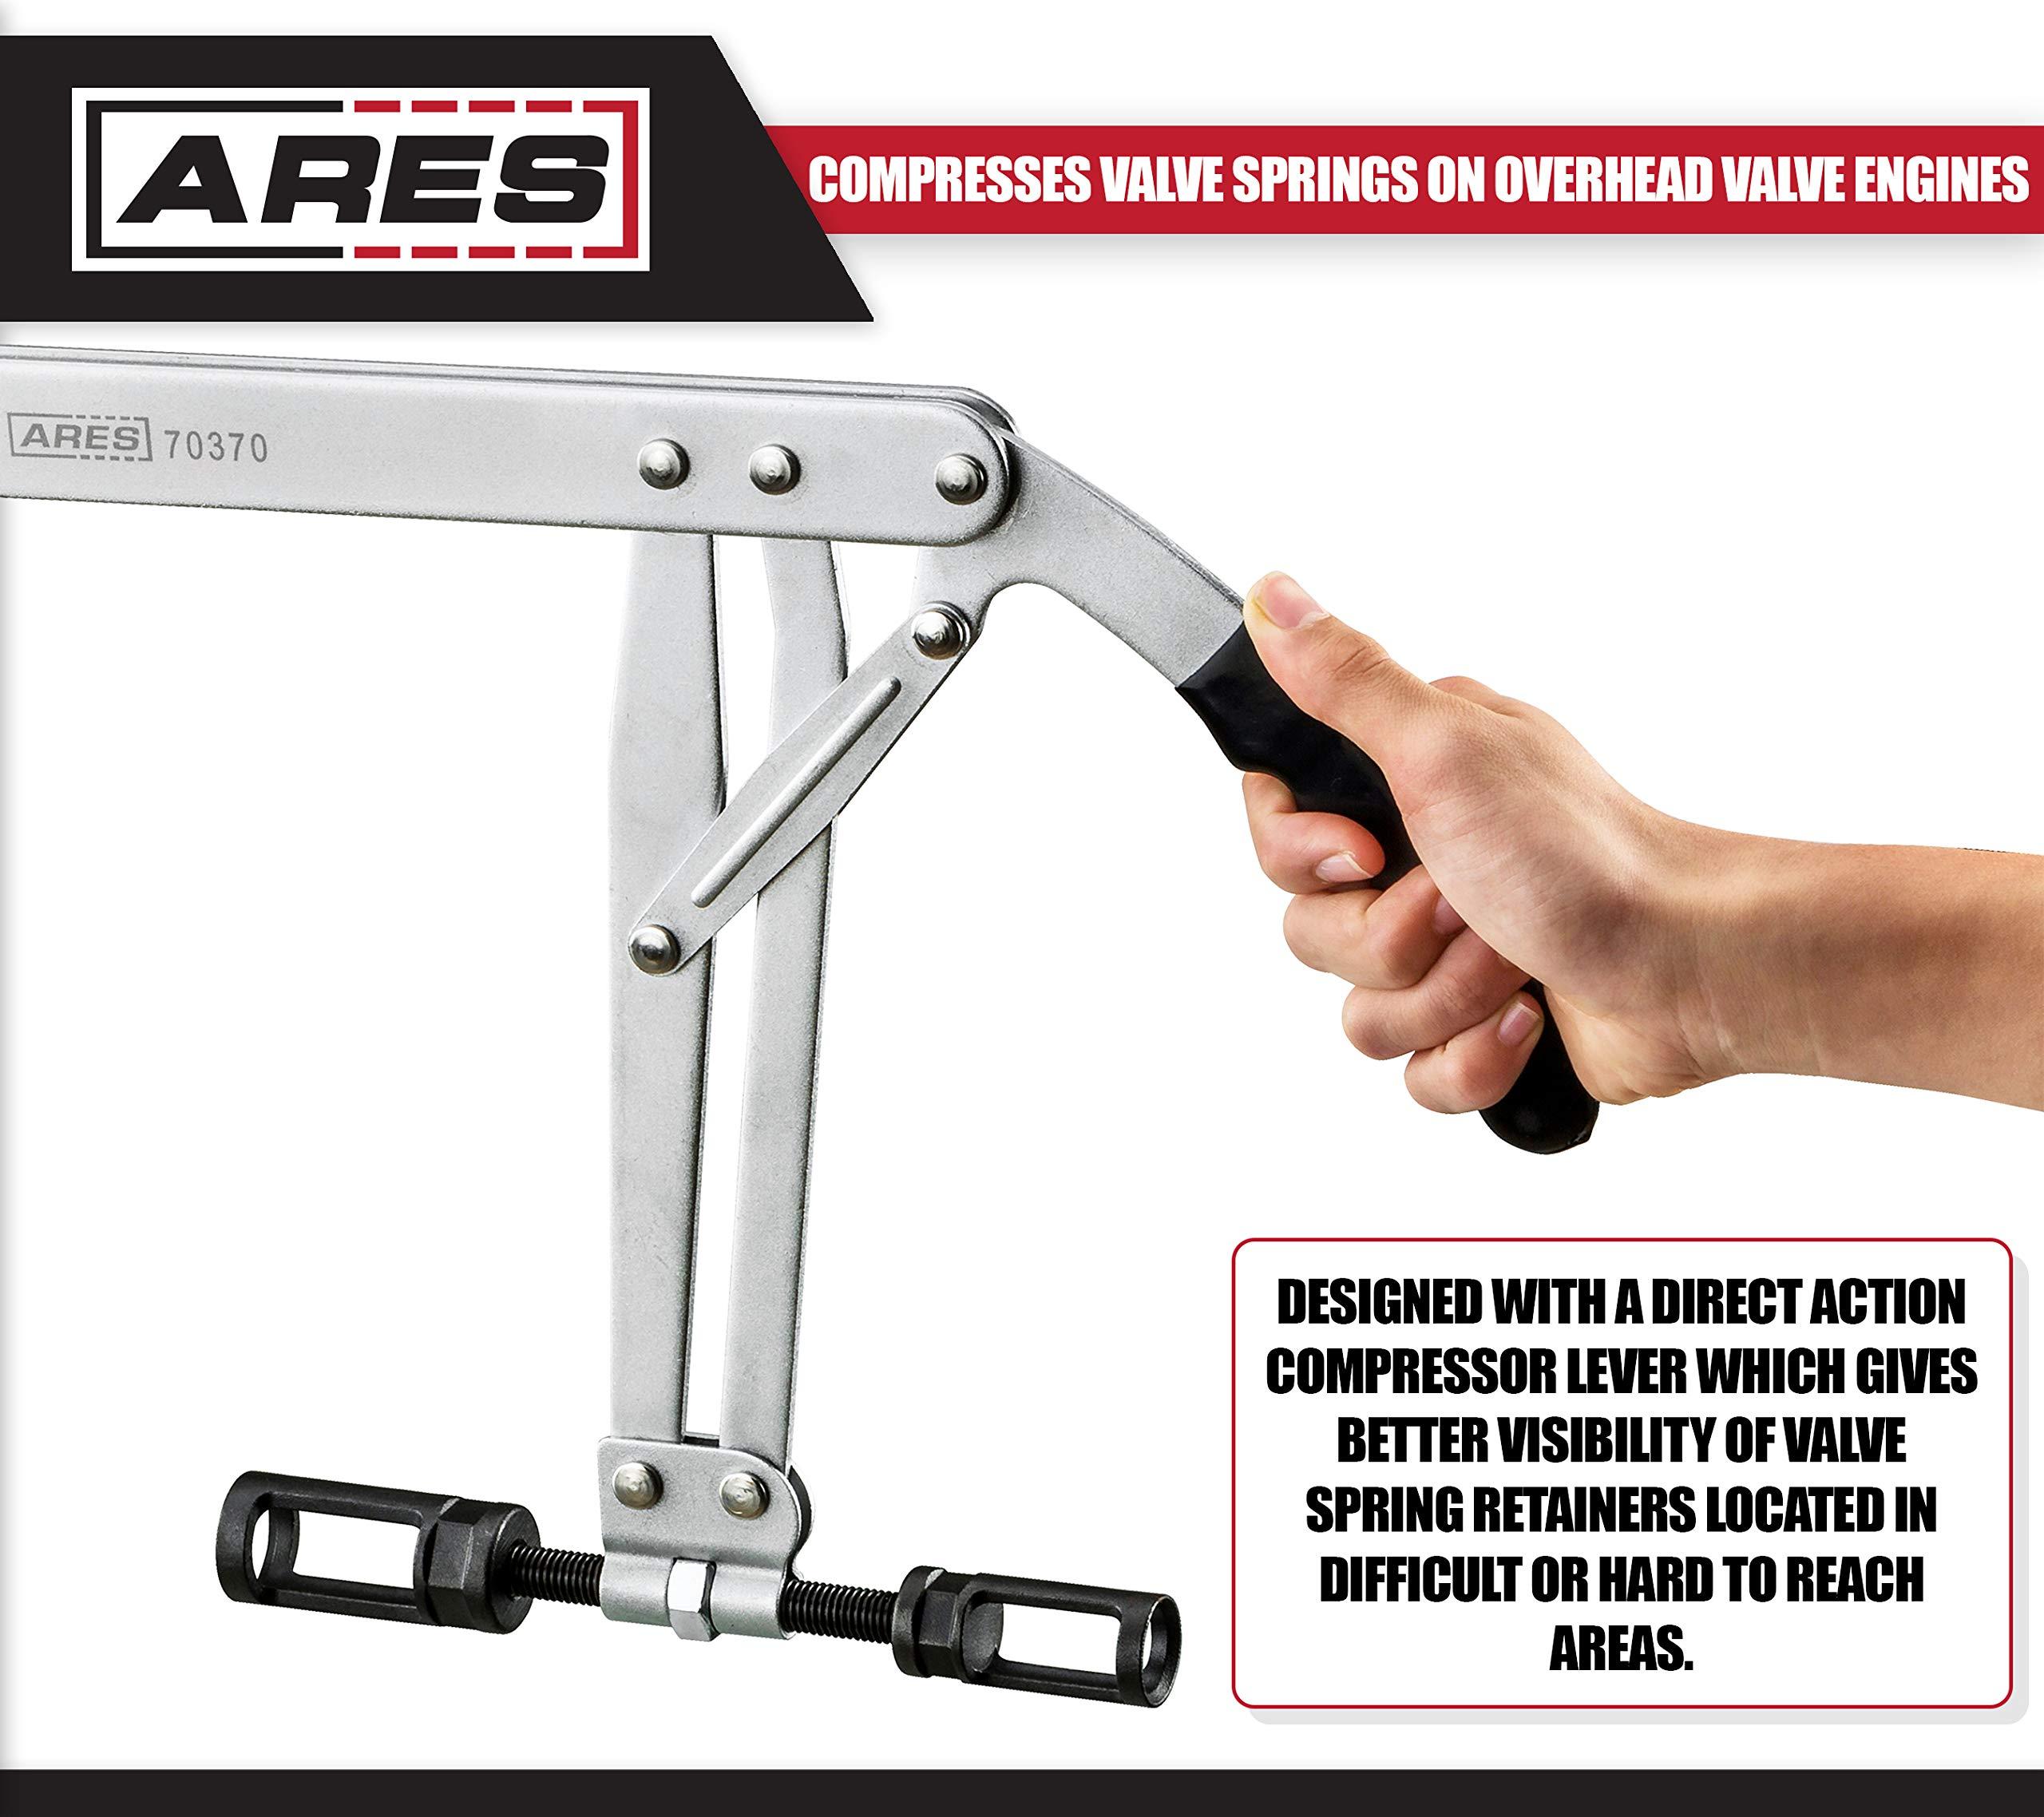 ARES 70370   Valve Spring Compressor   Compresses Valve Springs on Overhead Valve Engines   Direct Action Compressor Lever Gives Better Visibility During Valve Spring Compression by ARES (Image #3)